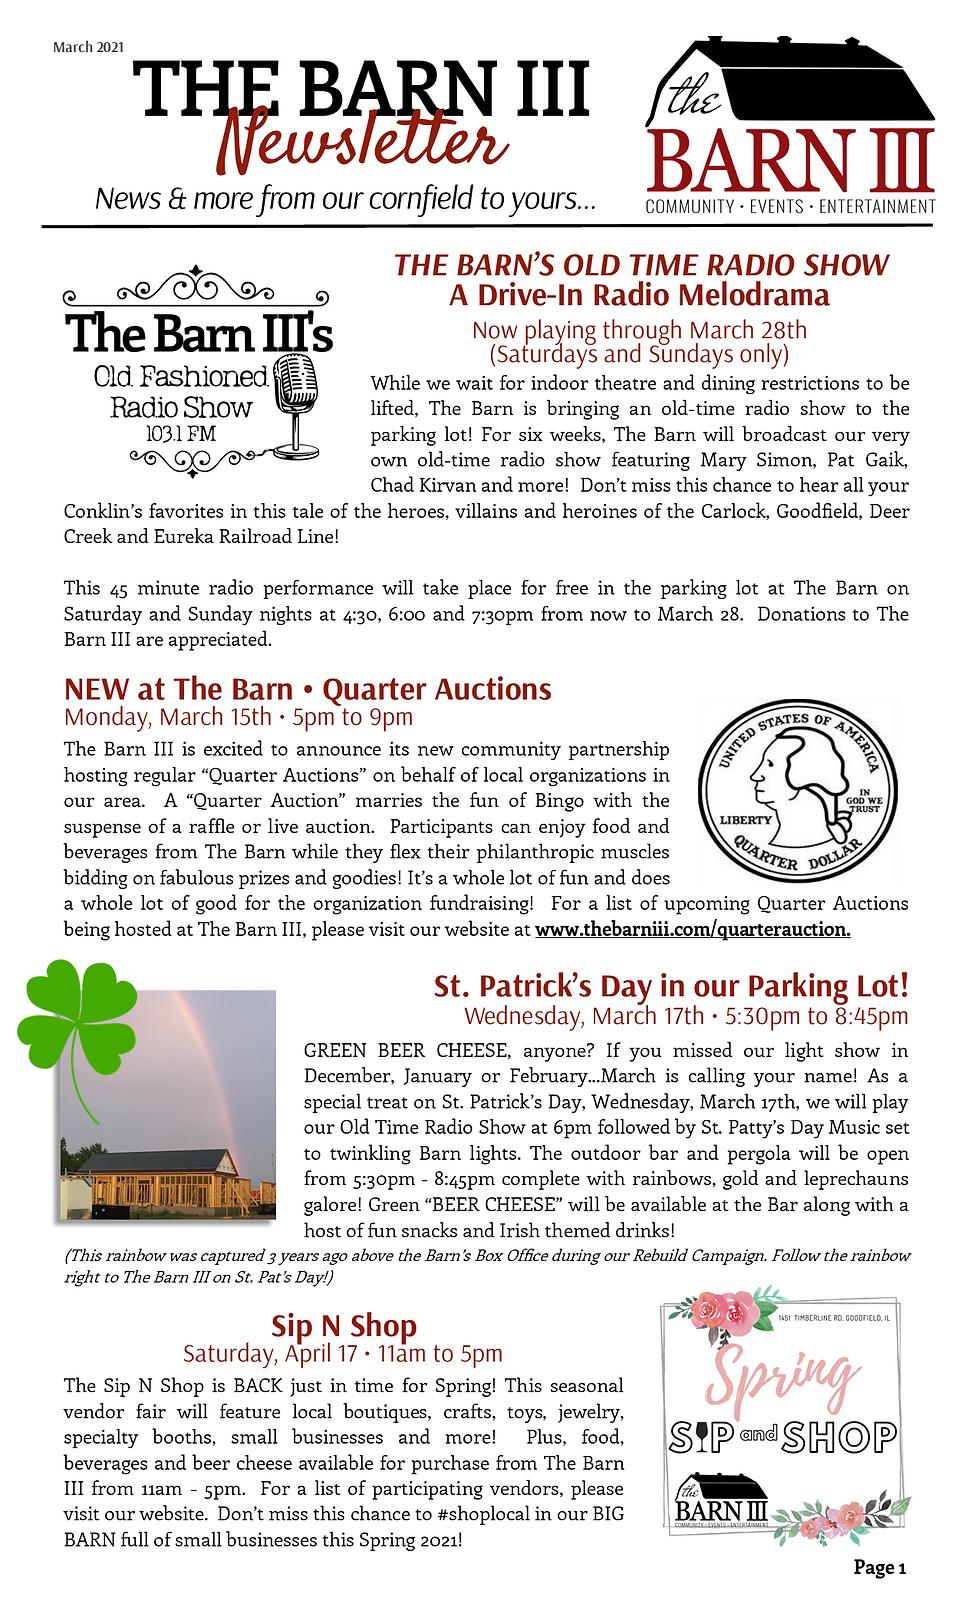 Page 1 - Barn Radio Show.png